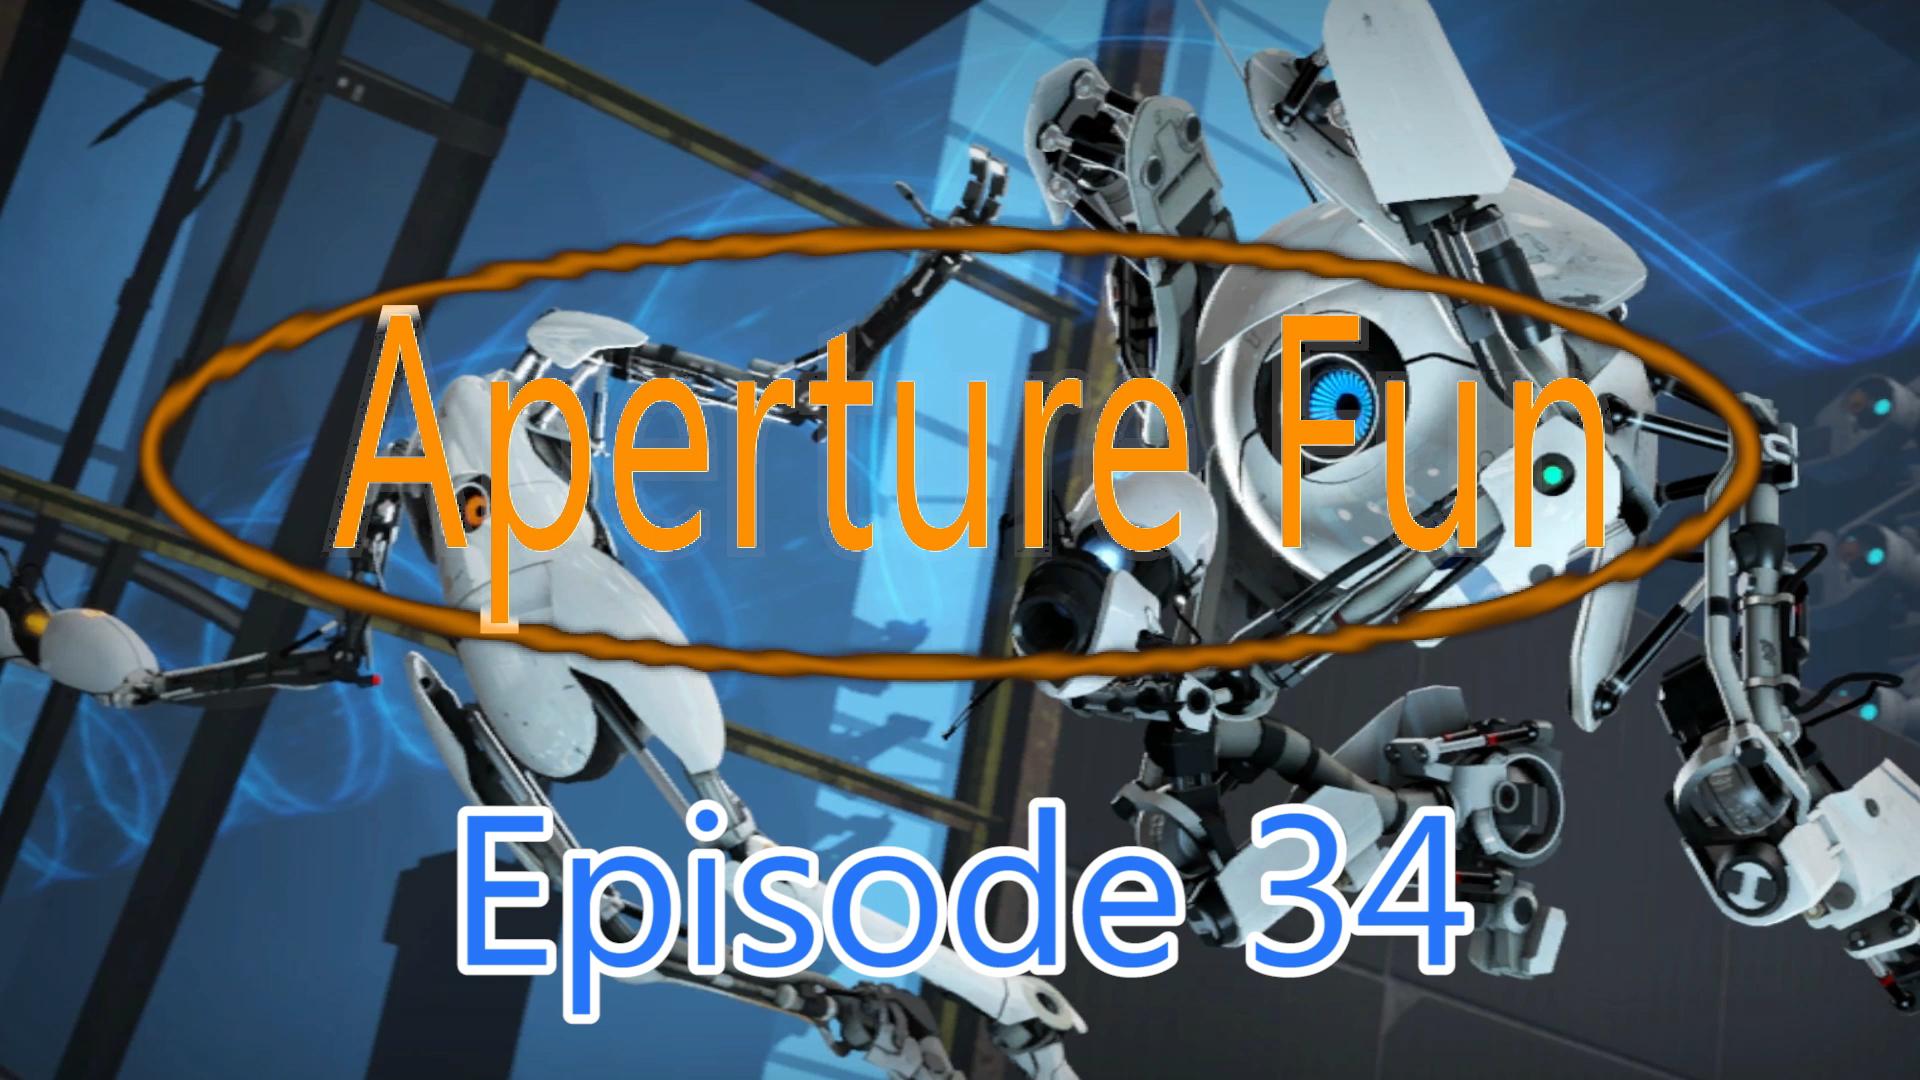 Aperture Fun Episode 34.jpg